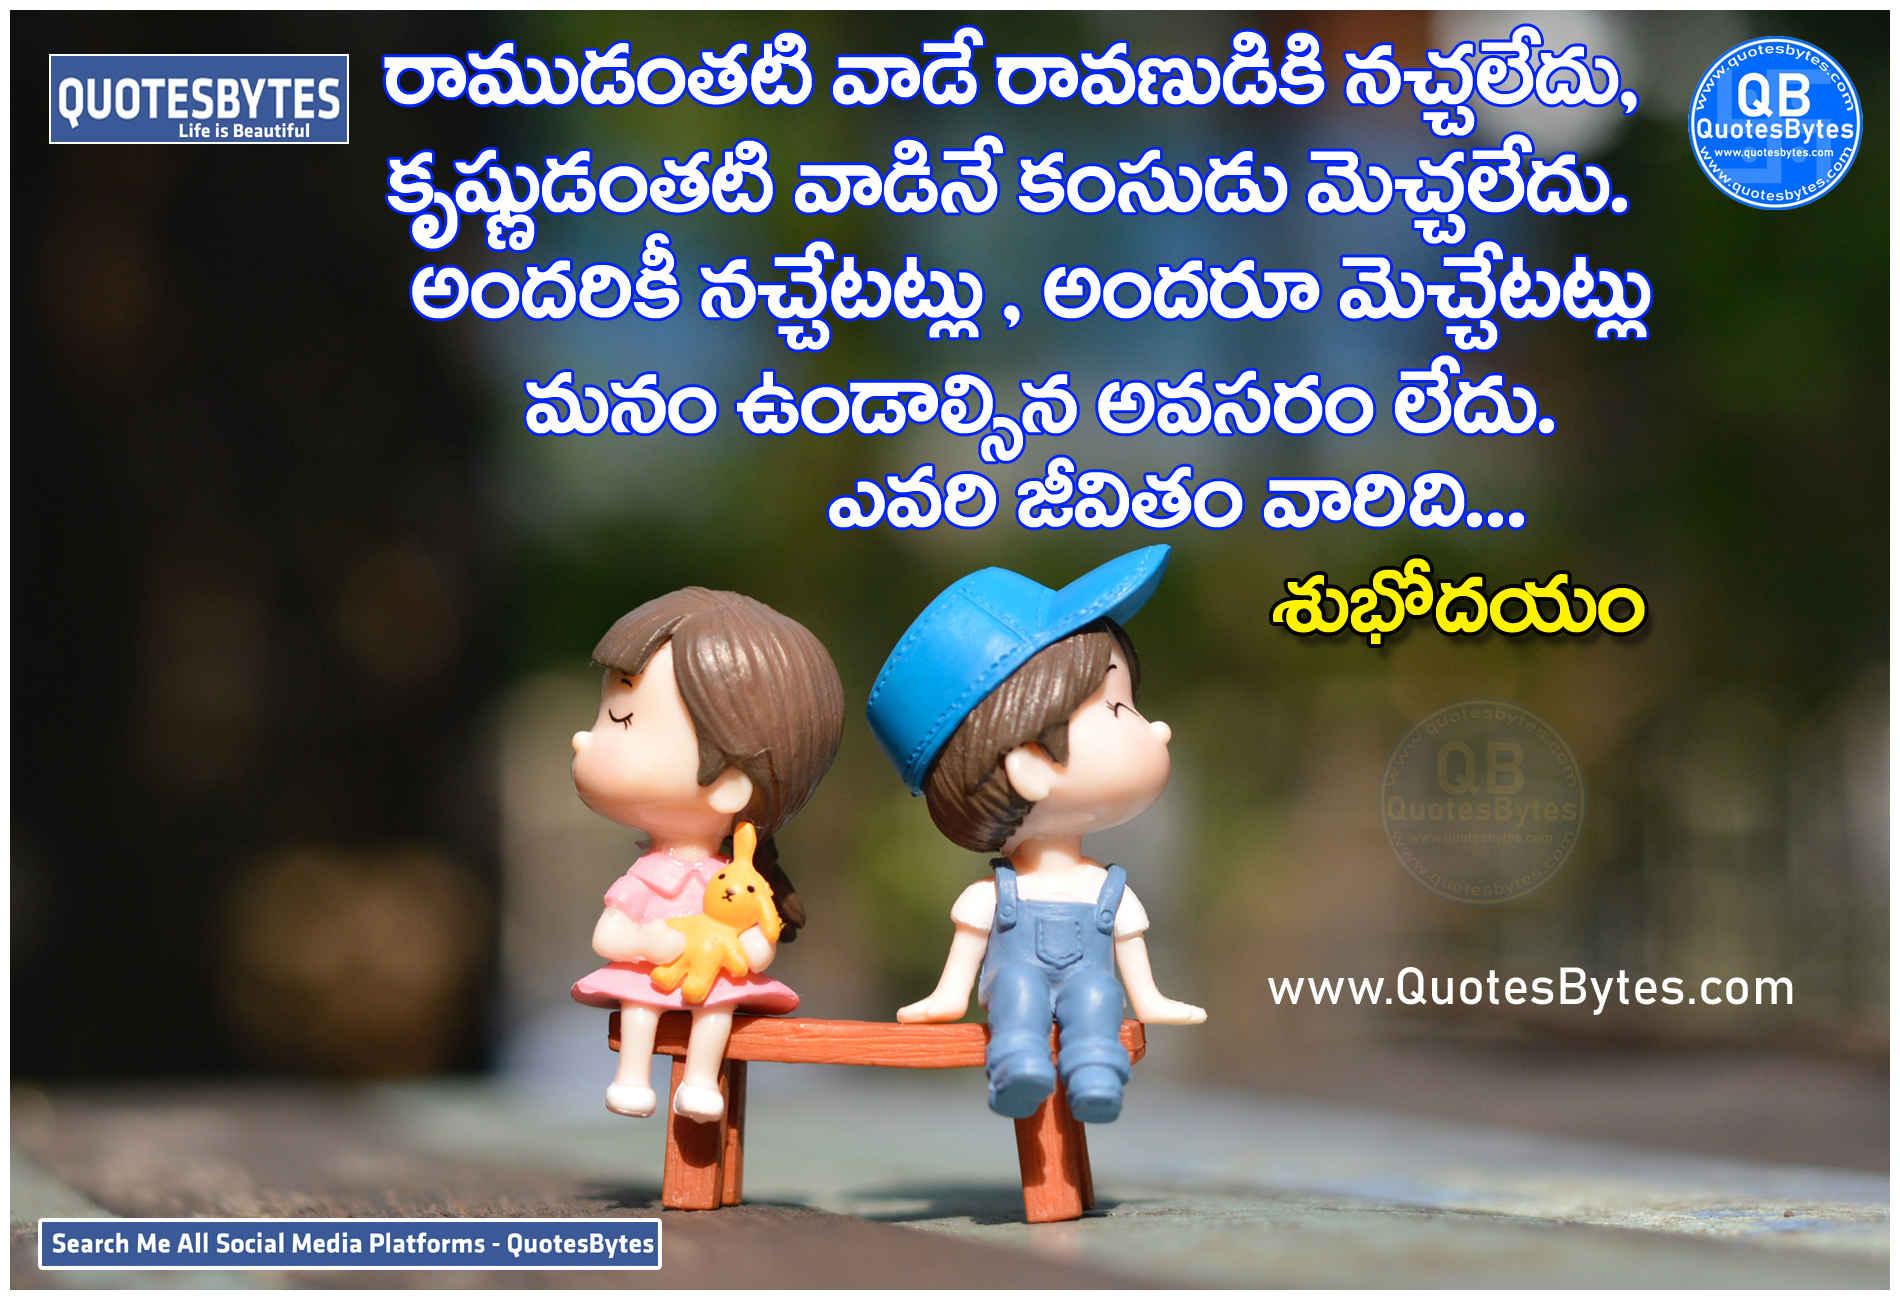 Good Morning in Telugu,Good Morning Quotes in Telugu,GOOD MORNING: QUOTES, IMAGES, SMS, WHATSAPP STATUS, WISHES, GREETINGS IN TELUGU,Good Morning Quotes Telugu,Good Morning Quotes in Telugu With Images,Telugu Good morning Greetings,Telugu Good Morning Quotes,Good Morning Quote In Telugu,Best Good Morning Quotes in Telugu with Images for 2021,Good Morning Quotes Inspirational In Telugu,Telugu Good Morning Inspirational Quotes-Messages On Life In Telugu,Good Morning Telugu Images with Quotes,telugu good morning wishes ,Heart touching good morning quotes in telugu,Good Morning Quotes In Telugu,Telugu New good morning quotes and Wishes 2021,Good Morning Wishes in Telugu,Beautiful Good morning quotes in telugu ,Good Morning Quotes With Images,Good Morning Quotes, Wishes In Telugu [ Latest 2021 ],Telugu Inspirational Good Morning Quotes,Good Morning Telugu Quotes,Telugu Good Morning Quotes images,Telugu inspirational Quotes images, Telugu Good morning quotes in telugu,Good Morning Inspirational Quotes Telugu,good morning kavithalu images in telugu,Best Good Morning Quotes Telugu Images,latest quotes about good morning quotes,Best Good Morning Quotes and Wishes,latest quotes in telugu,Best Good Morning Quotes In Telugu - Day Wishs,latest quotes for inspirational quotes in telugu,Good Morning Quotes Status SMS,toptelugu good morning quotes in telugu,Good Morning Quotes Inspirational In Telugu,latestkavithalu image in telugu,Fresh Good Morning Messages In Telugu,Good Morning Telugu,good morning images,good morning quotes,funny good morning .